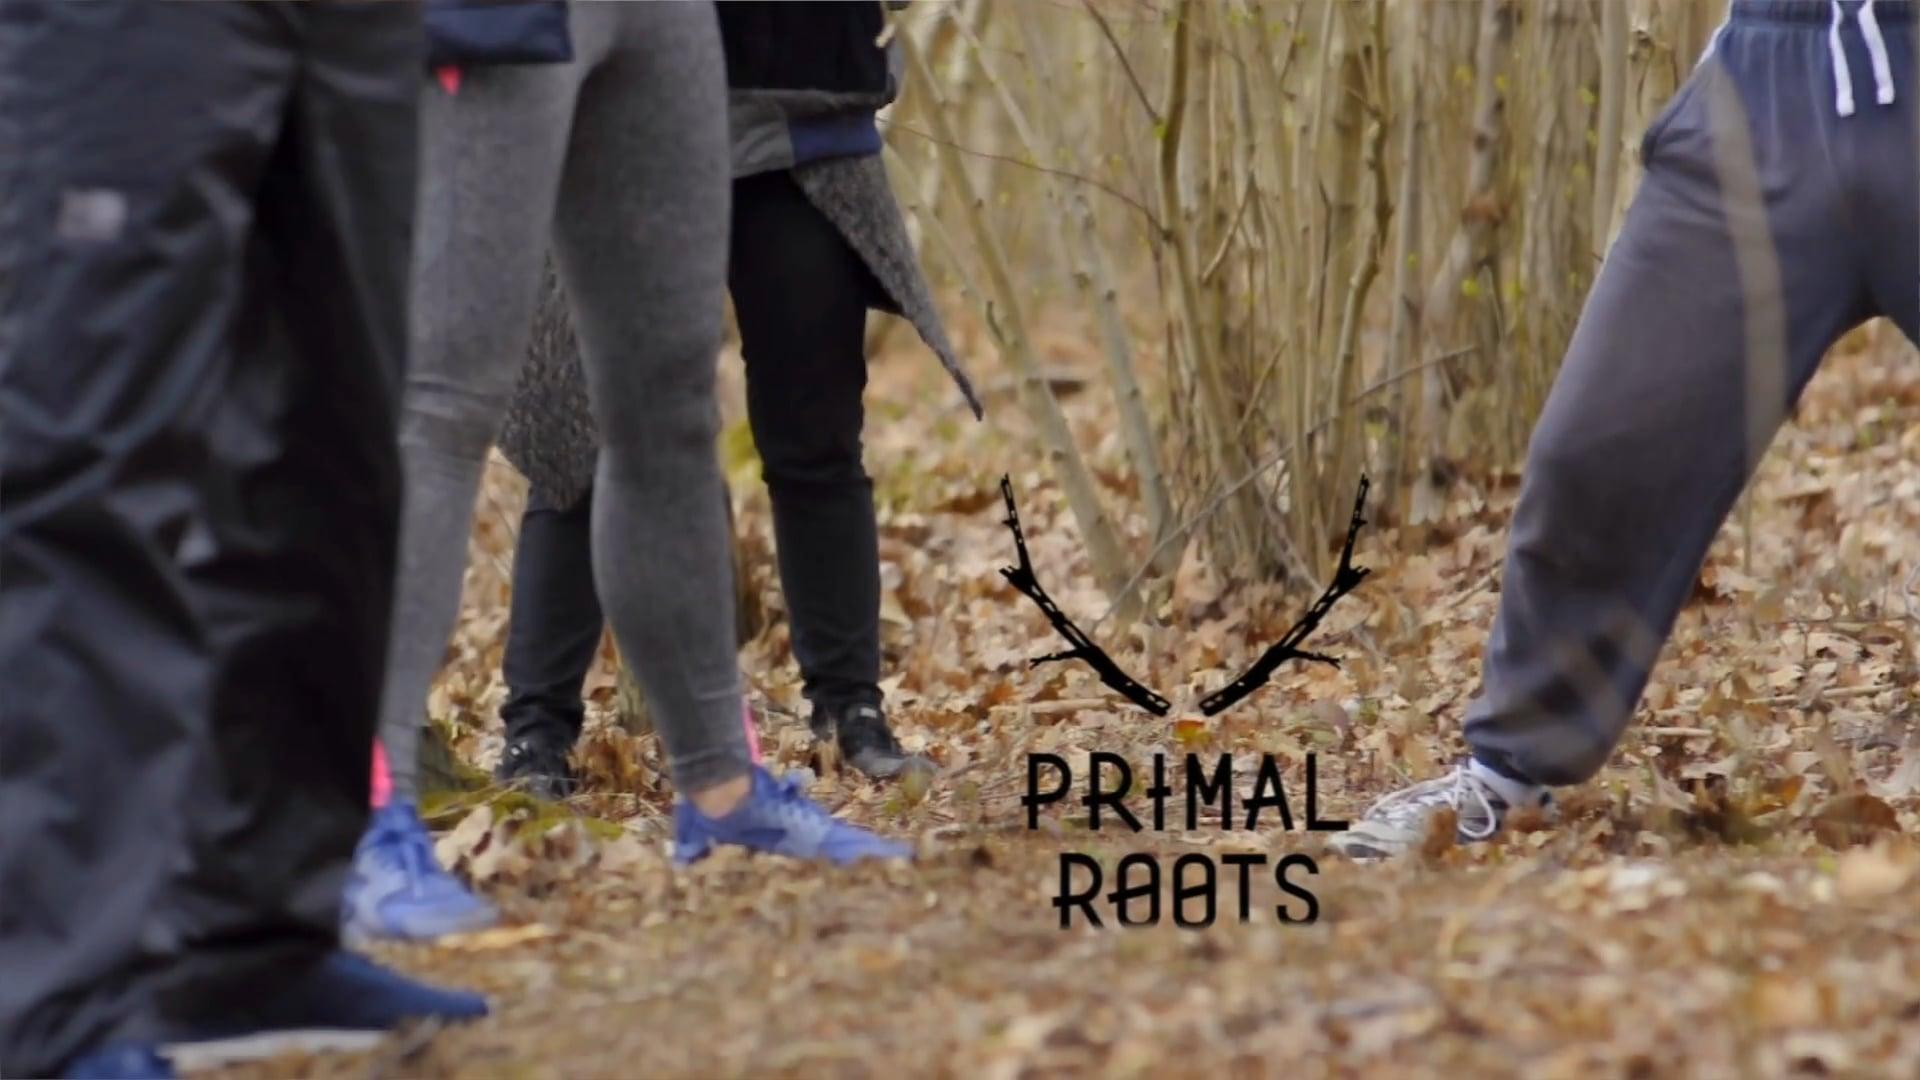 Primal Roots